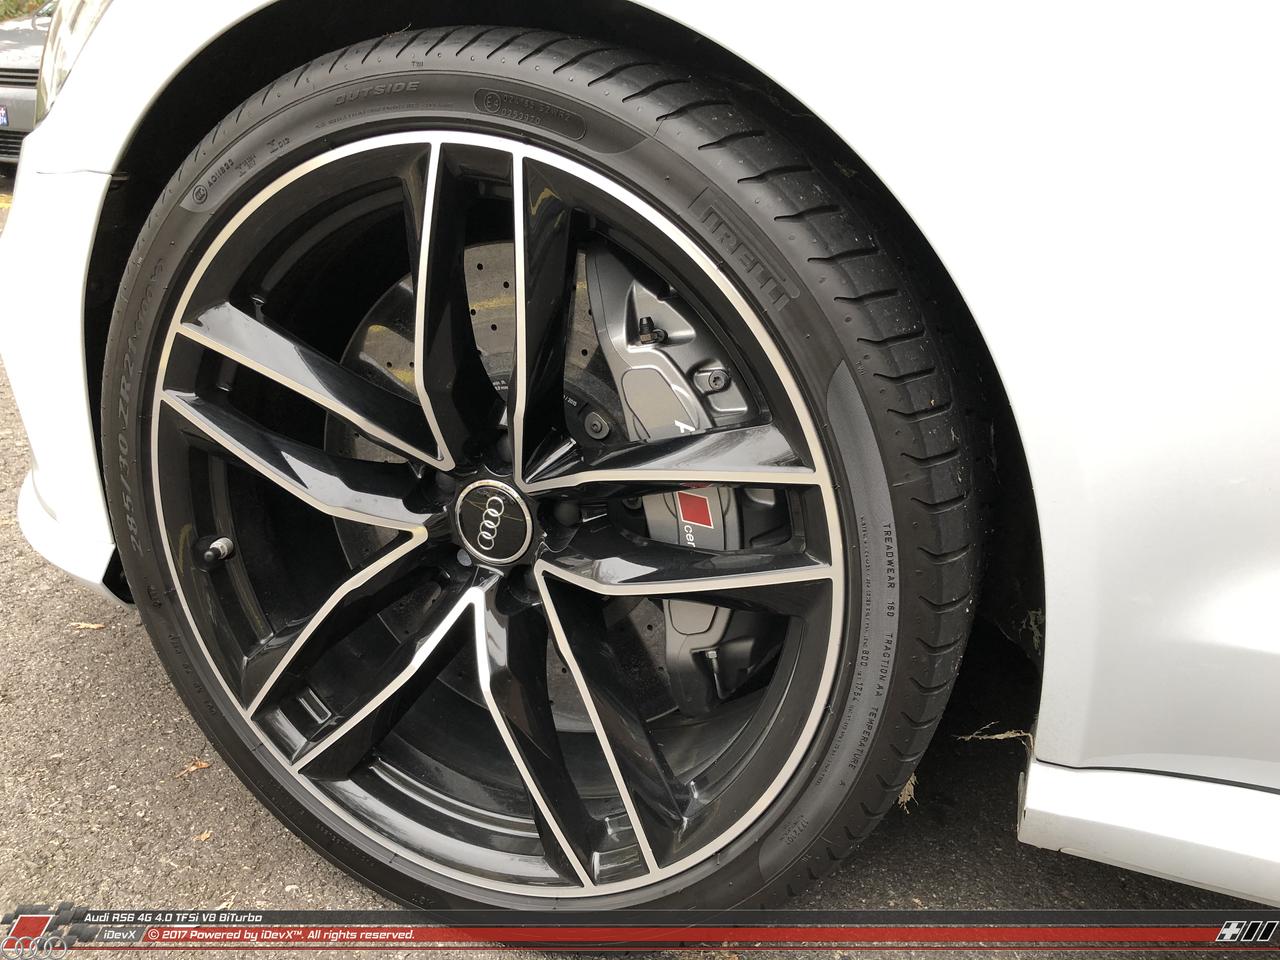 10_11.2018_Audi-RS6_iDevX_018.png